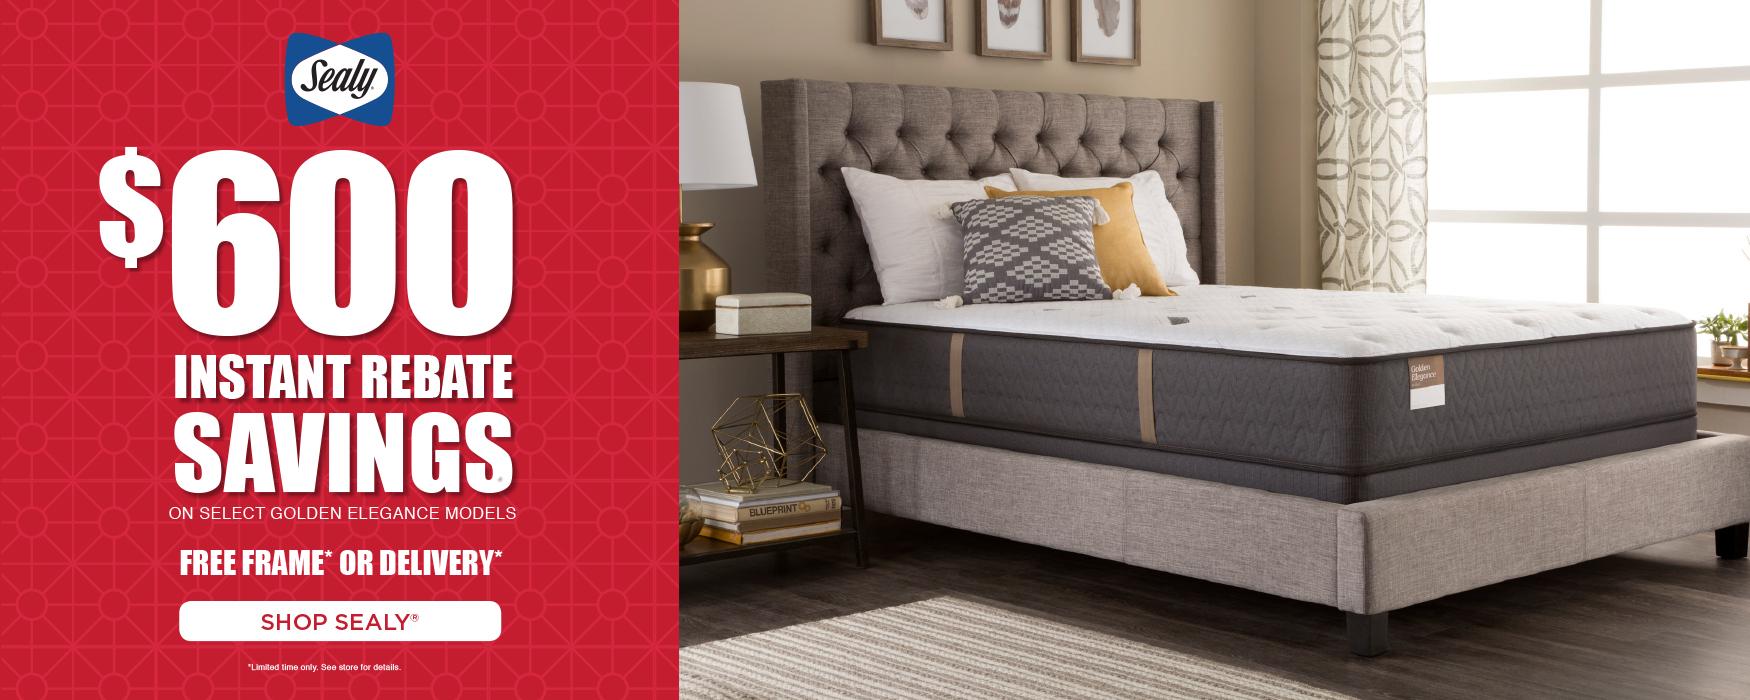 hilton furniture mattress